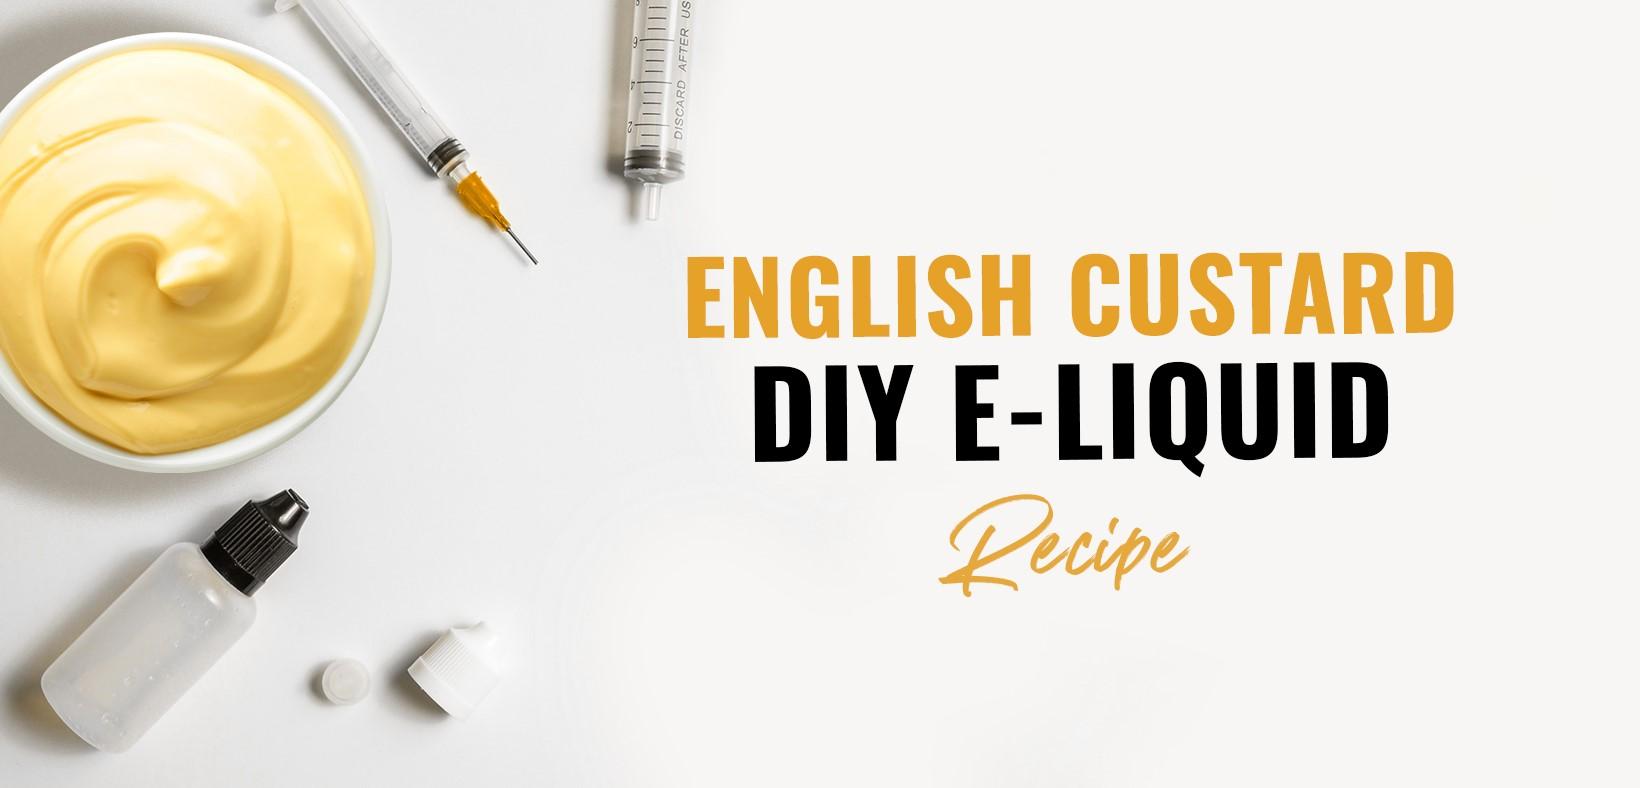 diy english custard vape e-liquid